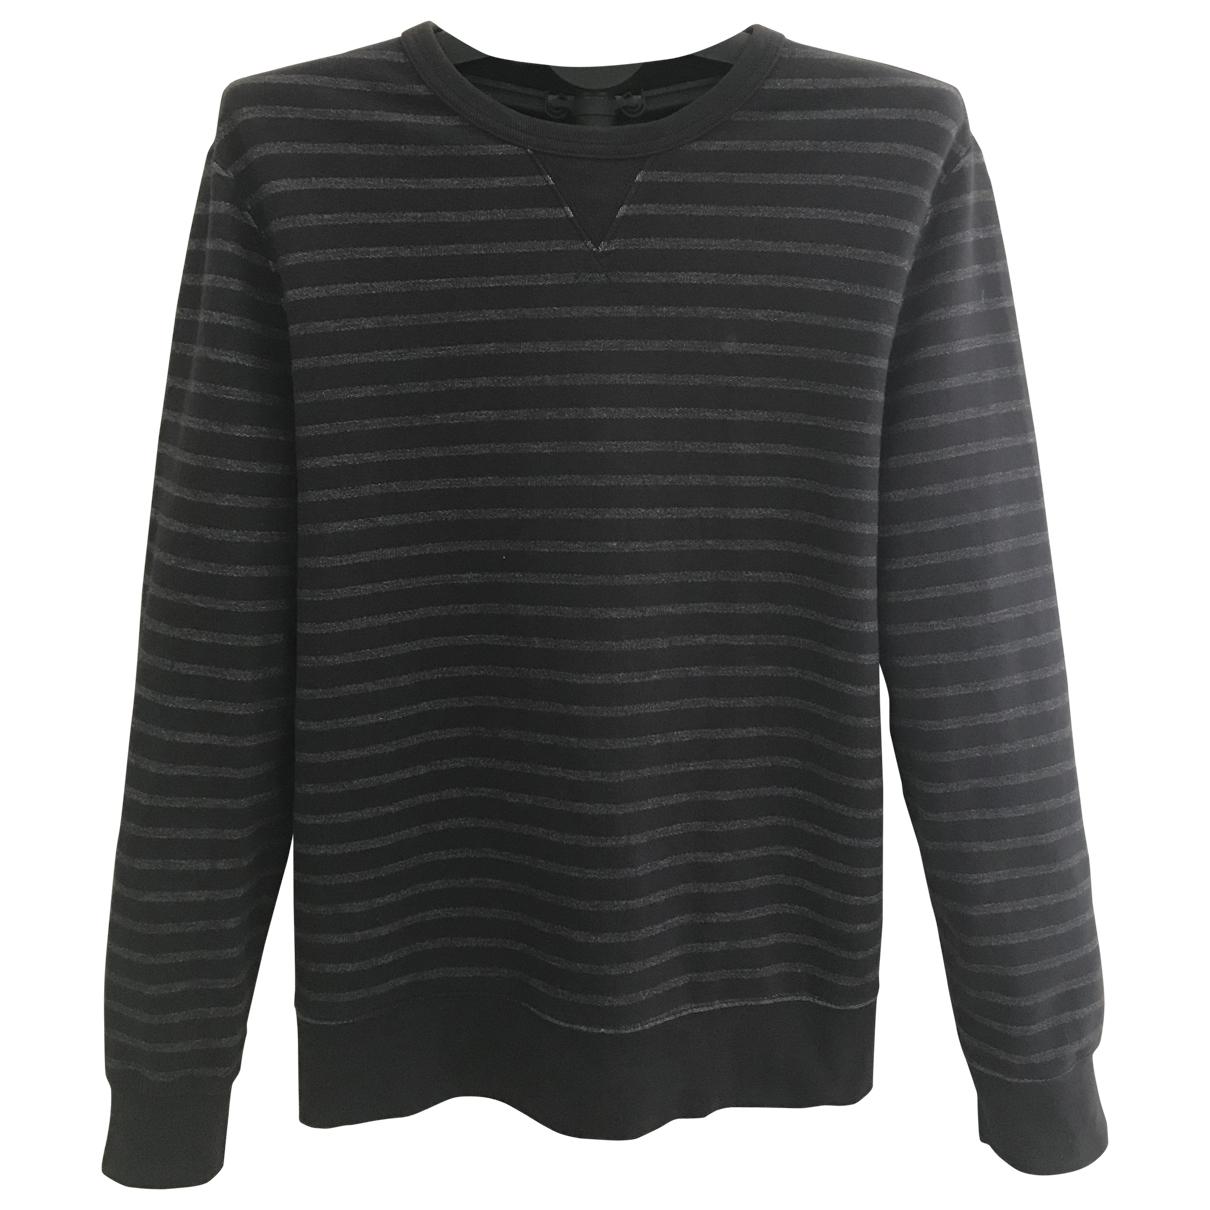 Levi's \N Black Cotton Knitwear & Sweatshirts for Men M International